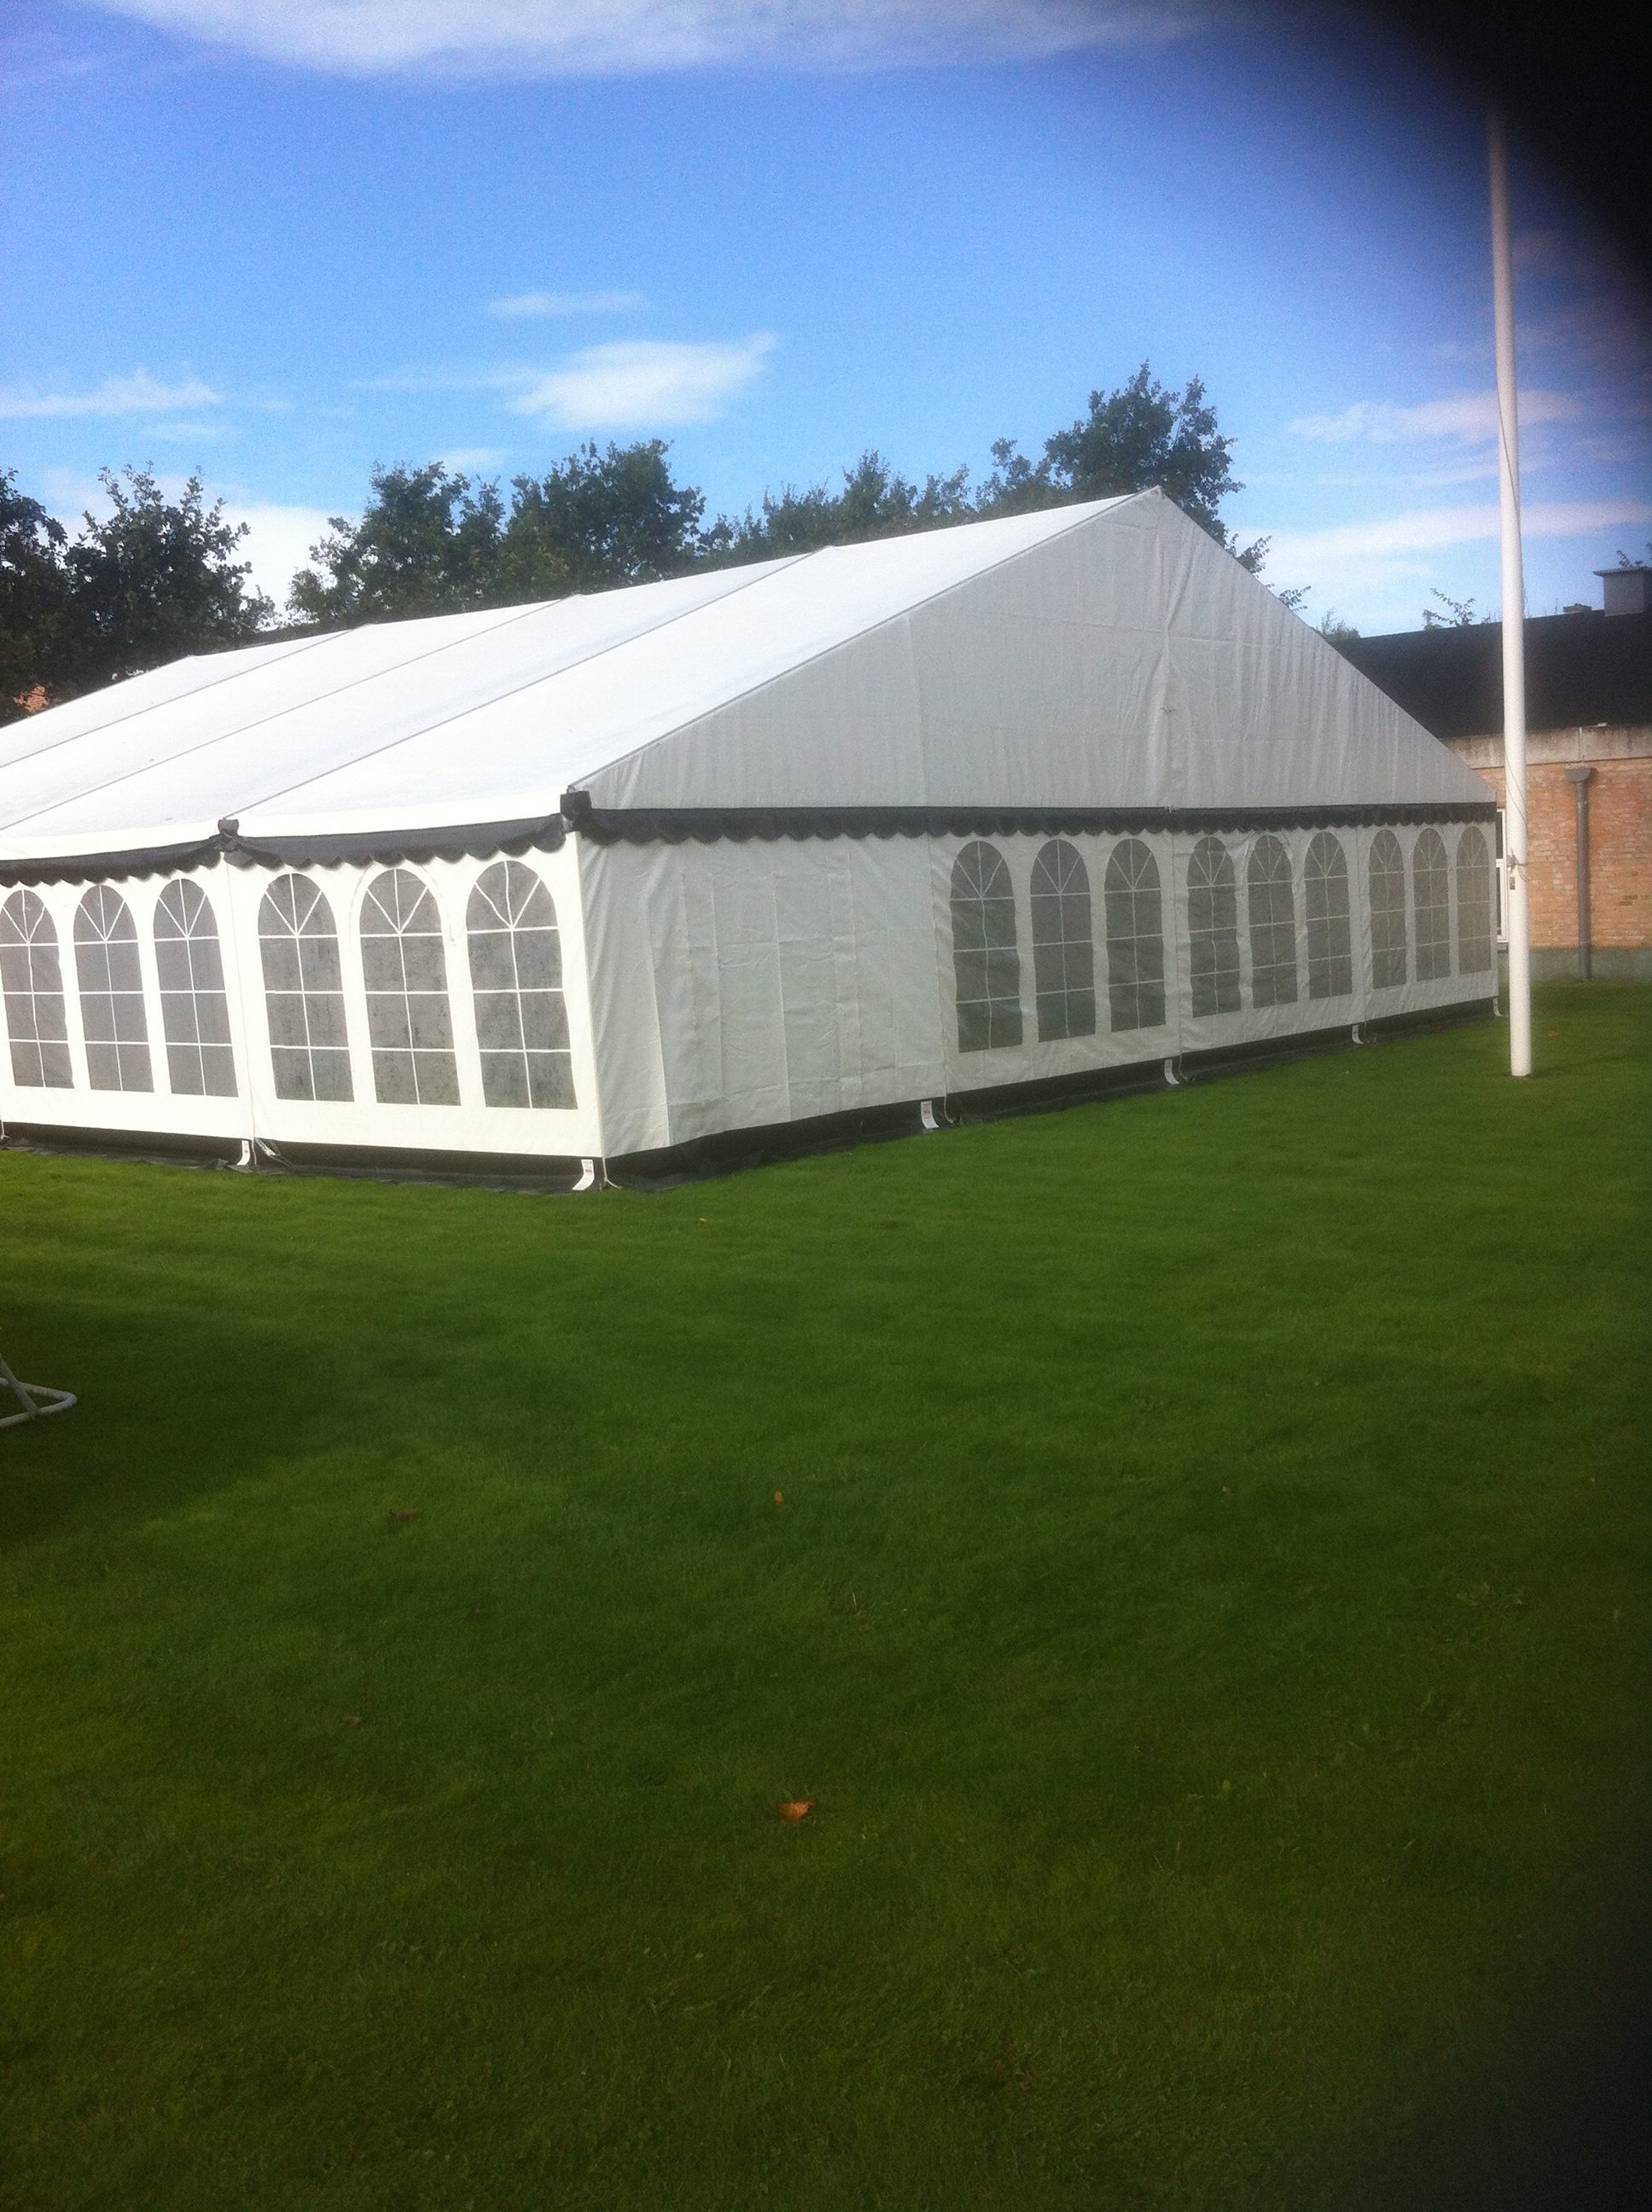 Telt 9x18 (162 m2) Flot telt til fest Lejes hos TommyTelt.dk